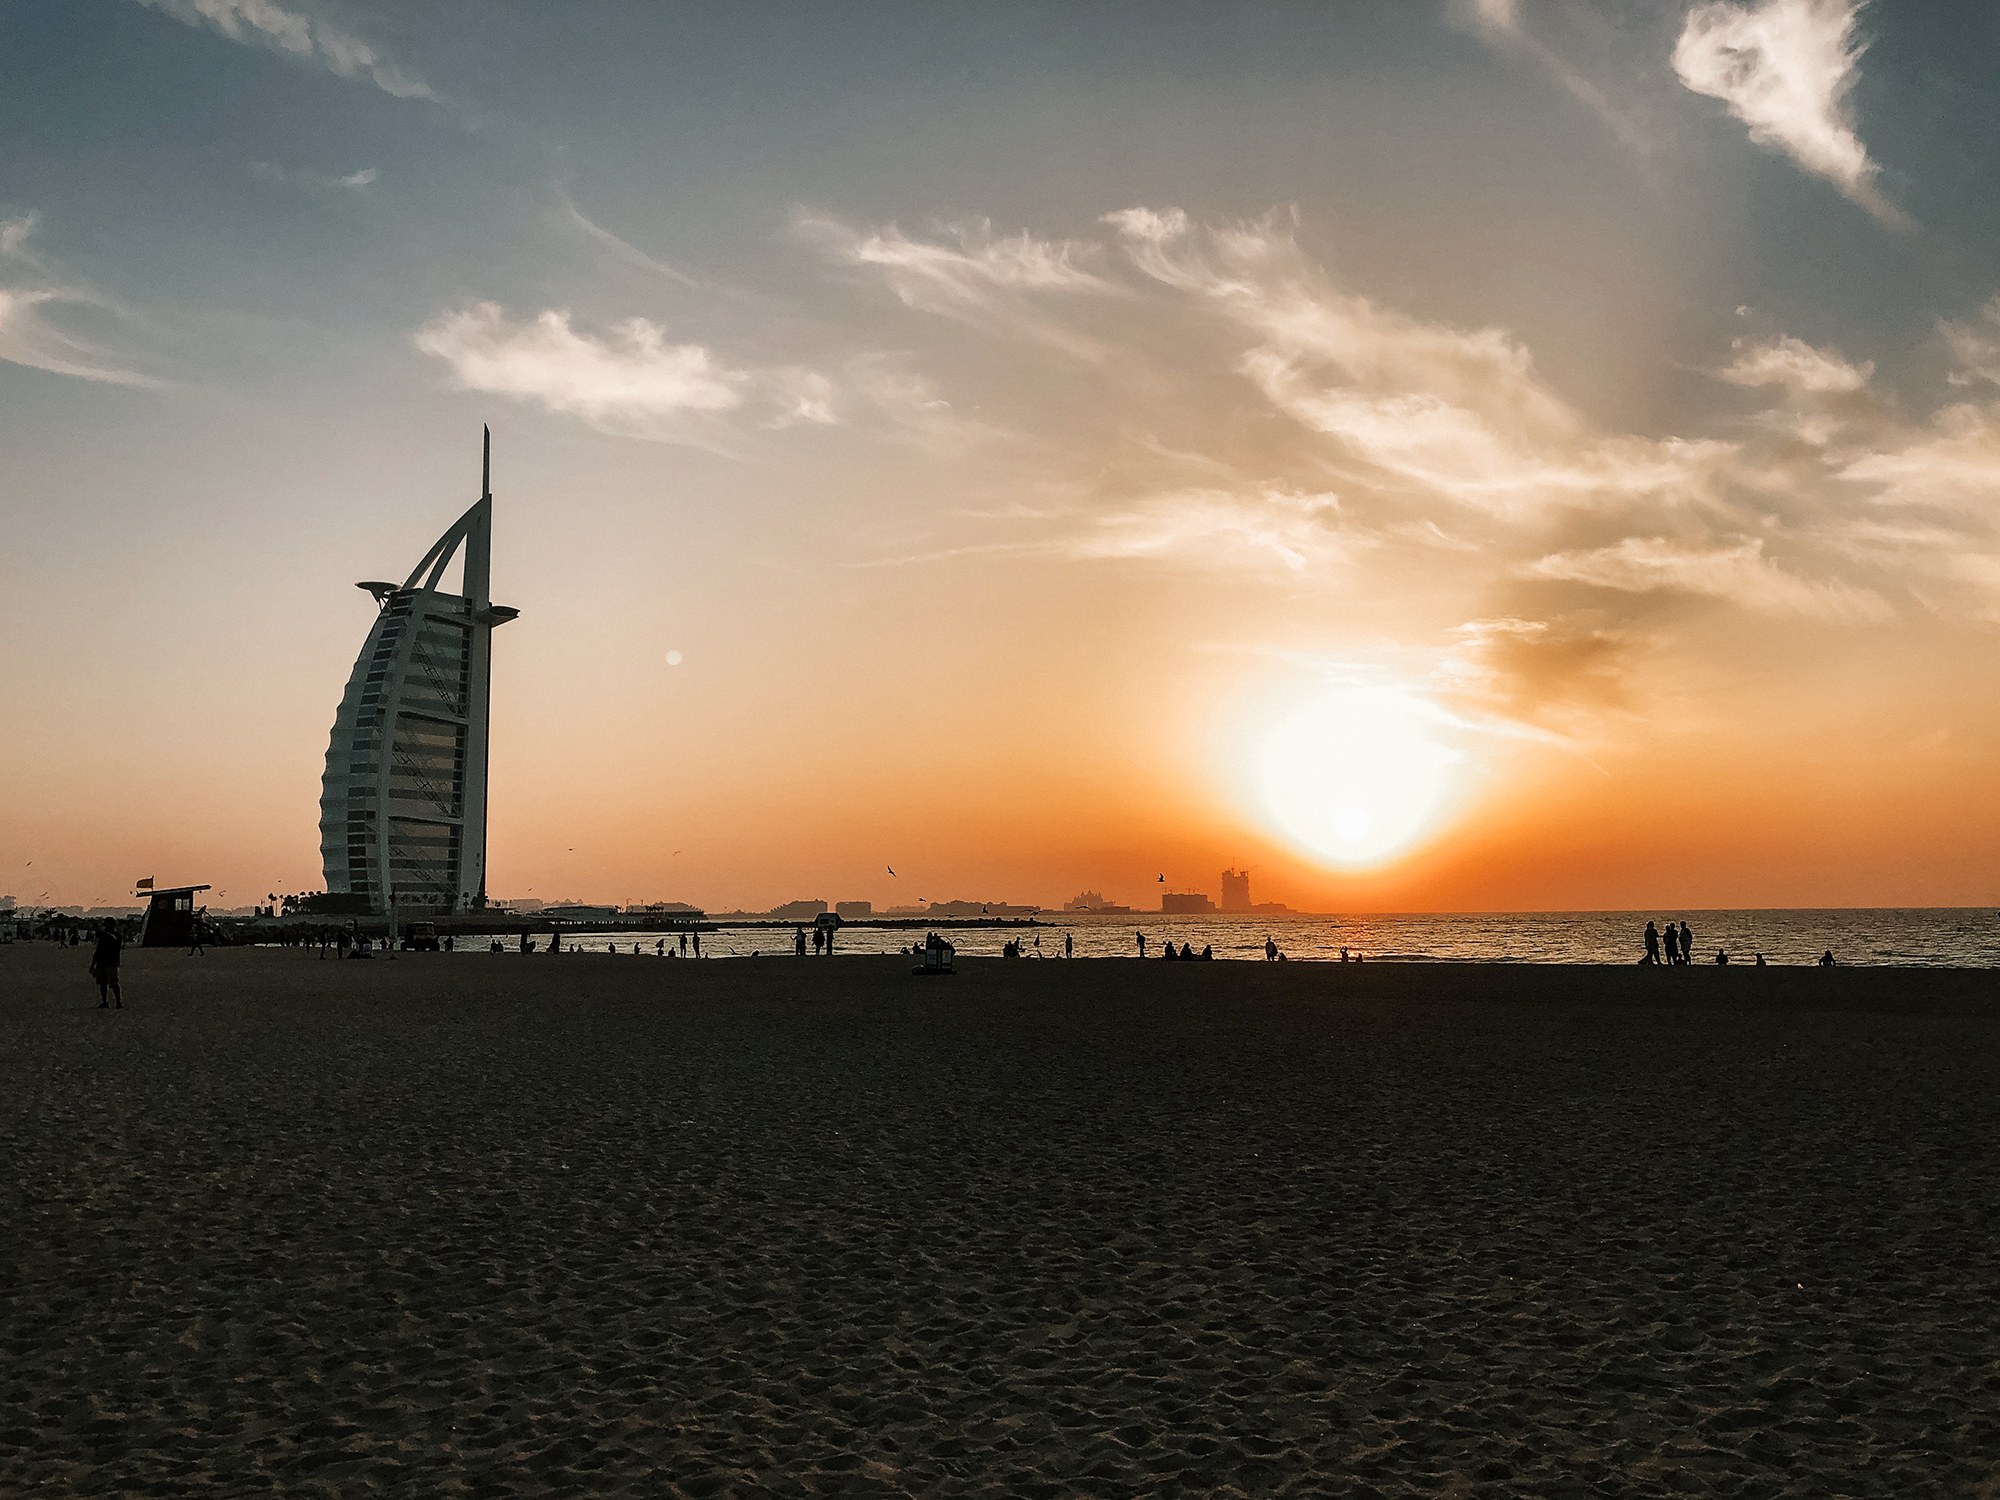 Dubai A-Ö | Dubai reseguide | Travel Guide Dubai | Jumeirah Public Beach | By Sandramaria | Sandramarias.com